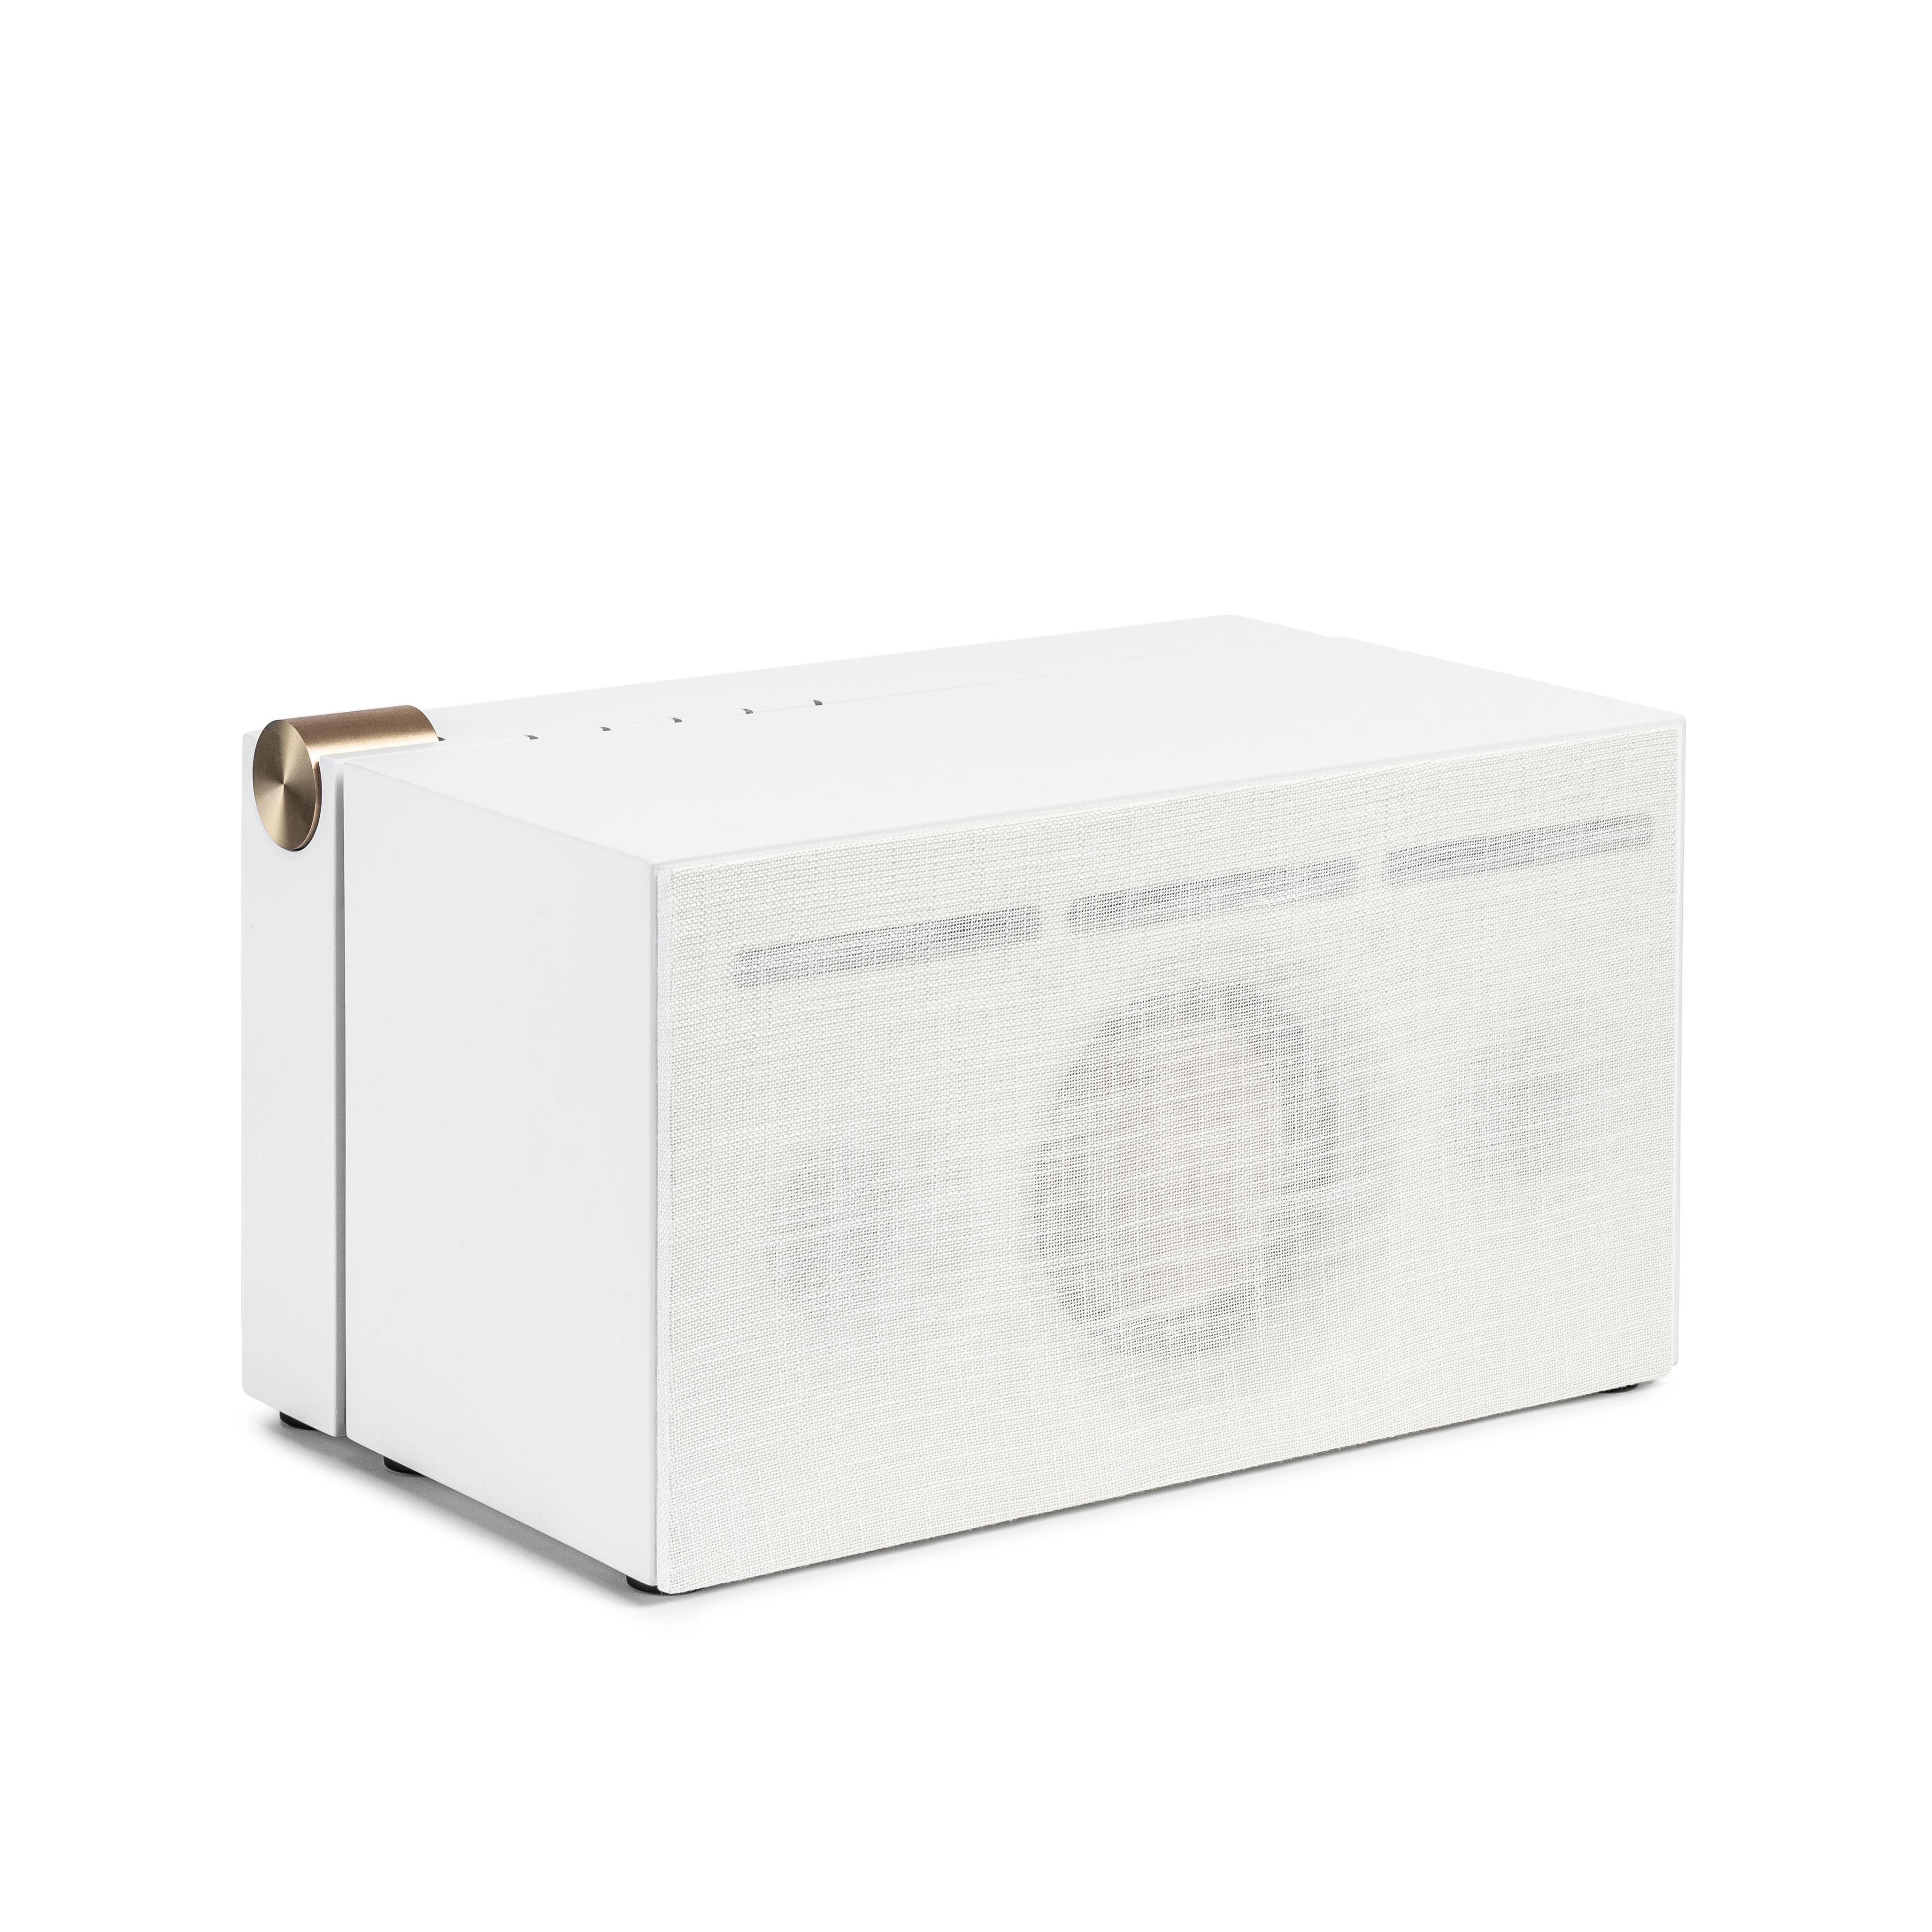 Accessories - Speakers & Audio - PR 01 Bluetooth speaker - / With Active Pressure Reflex technology by La Boîte Concept - White - Aluminium, Fabric, Wood